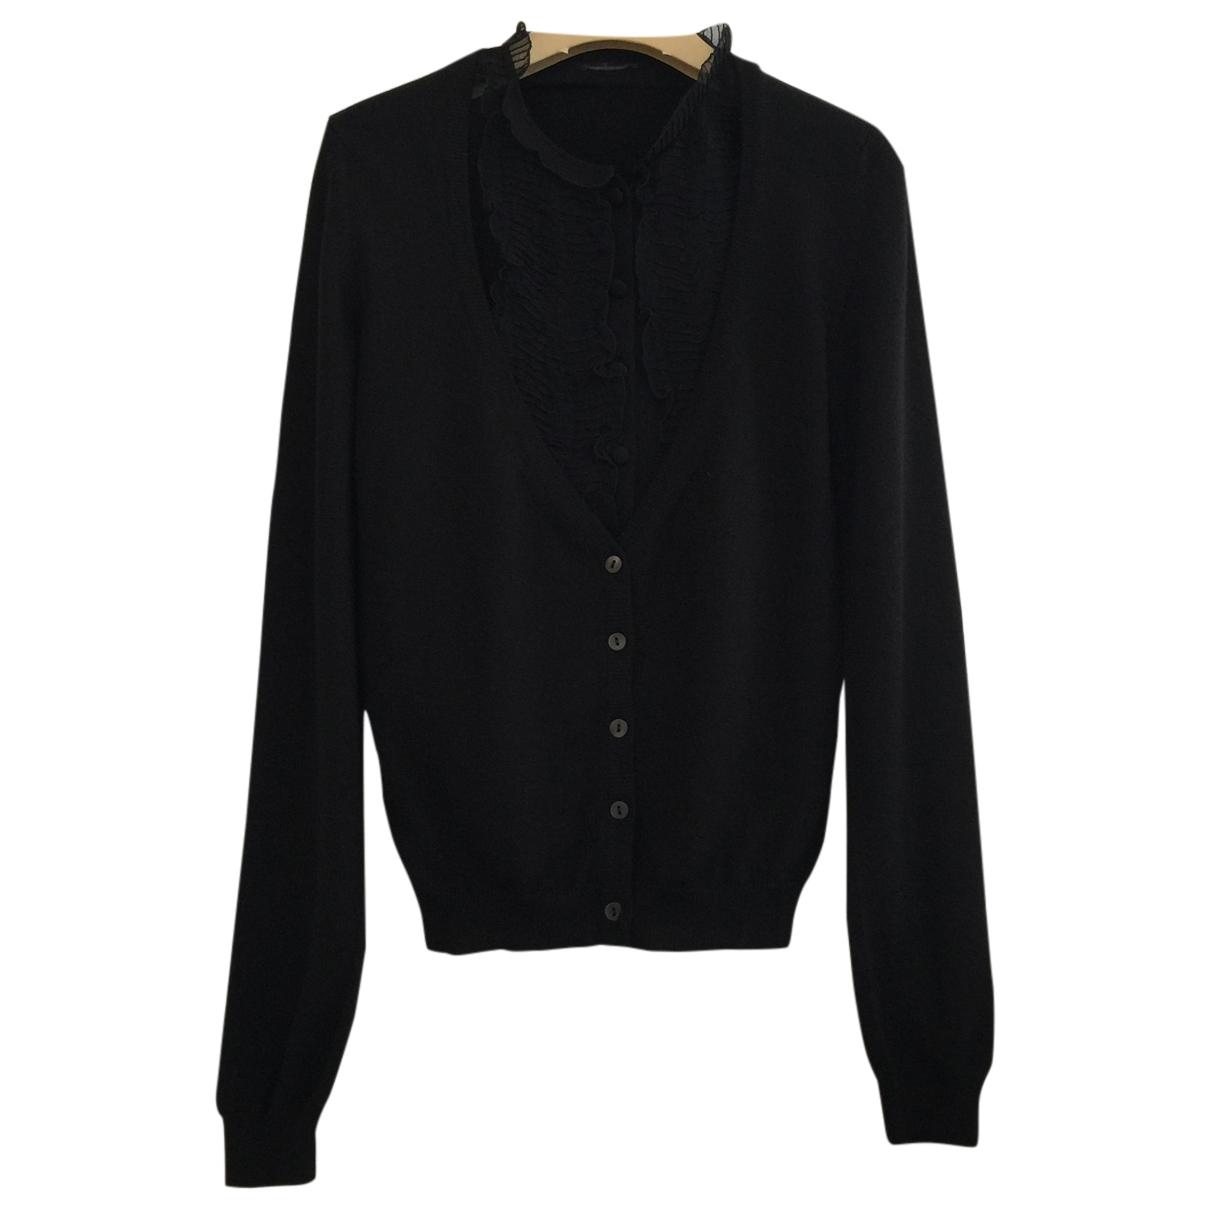 Miu Miu \N Black Wool Knitwear for Women 42 IT